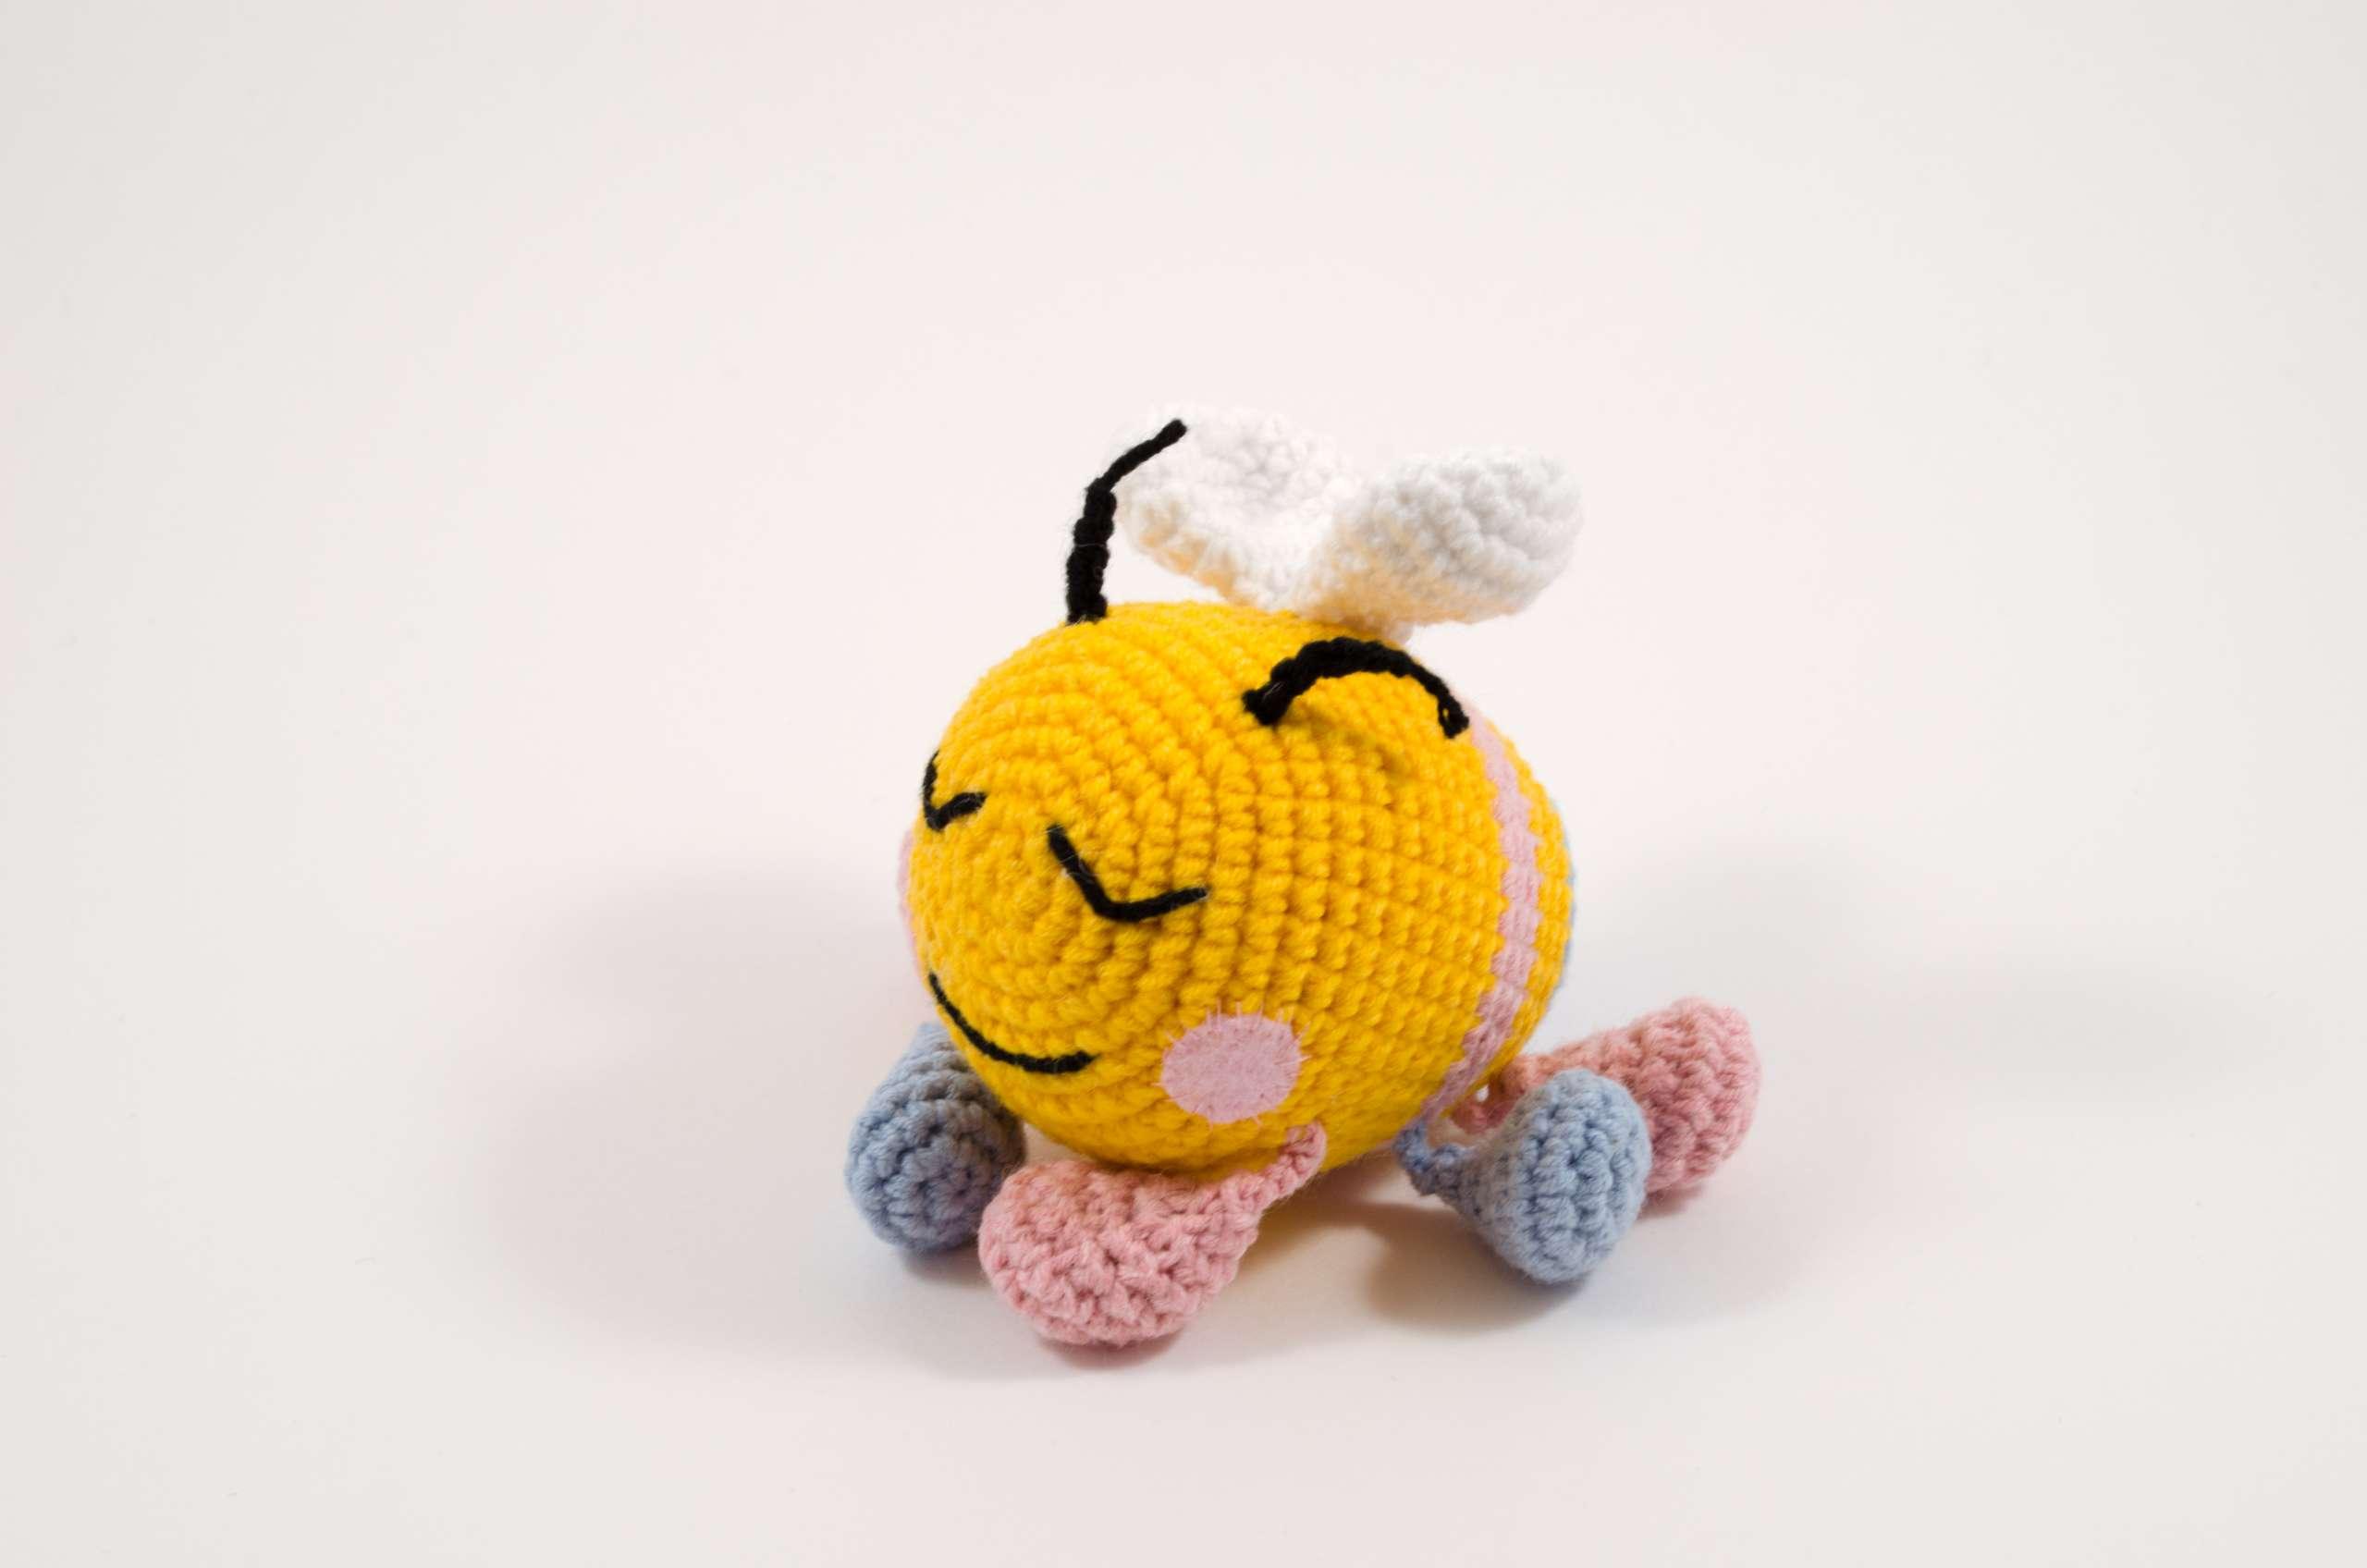 crochet bibi the bee toy